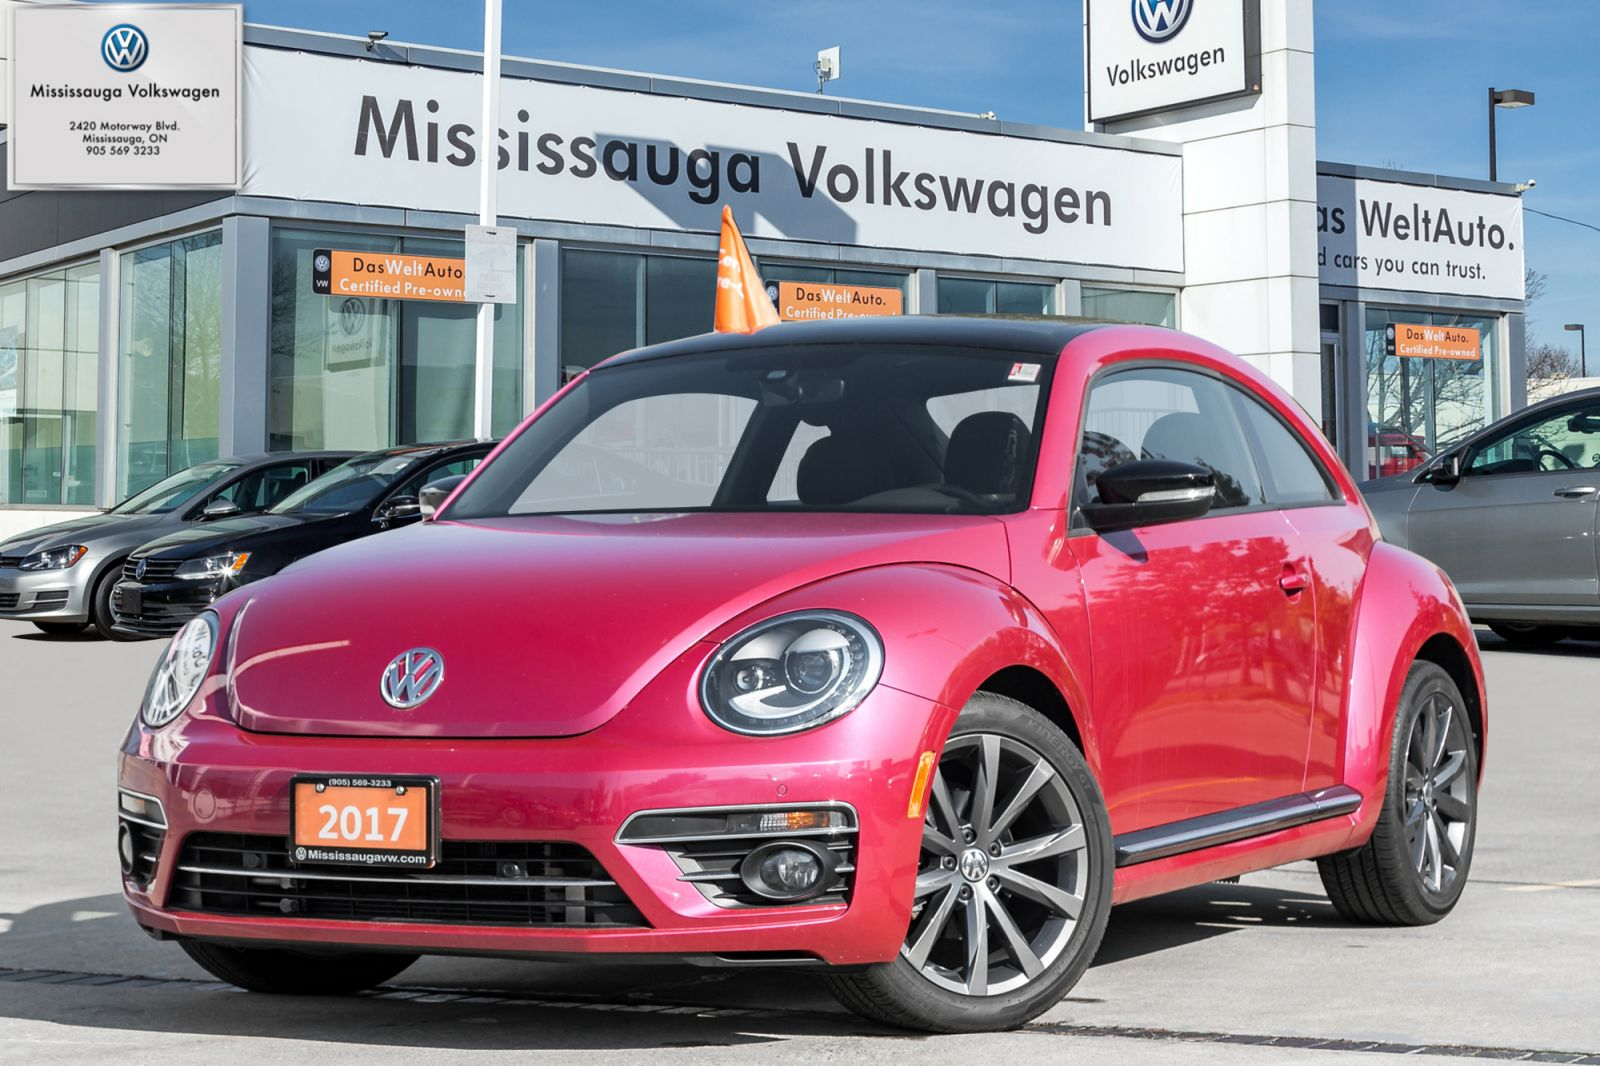 2017 Volkswagen Beetle Coupe Image